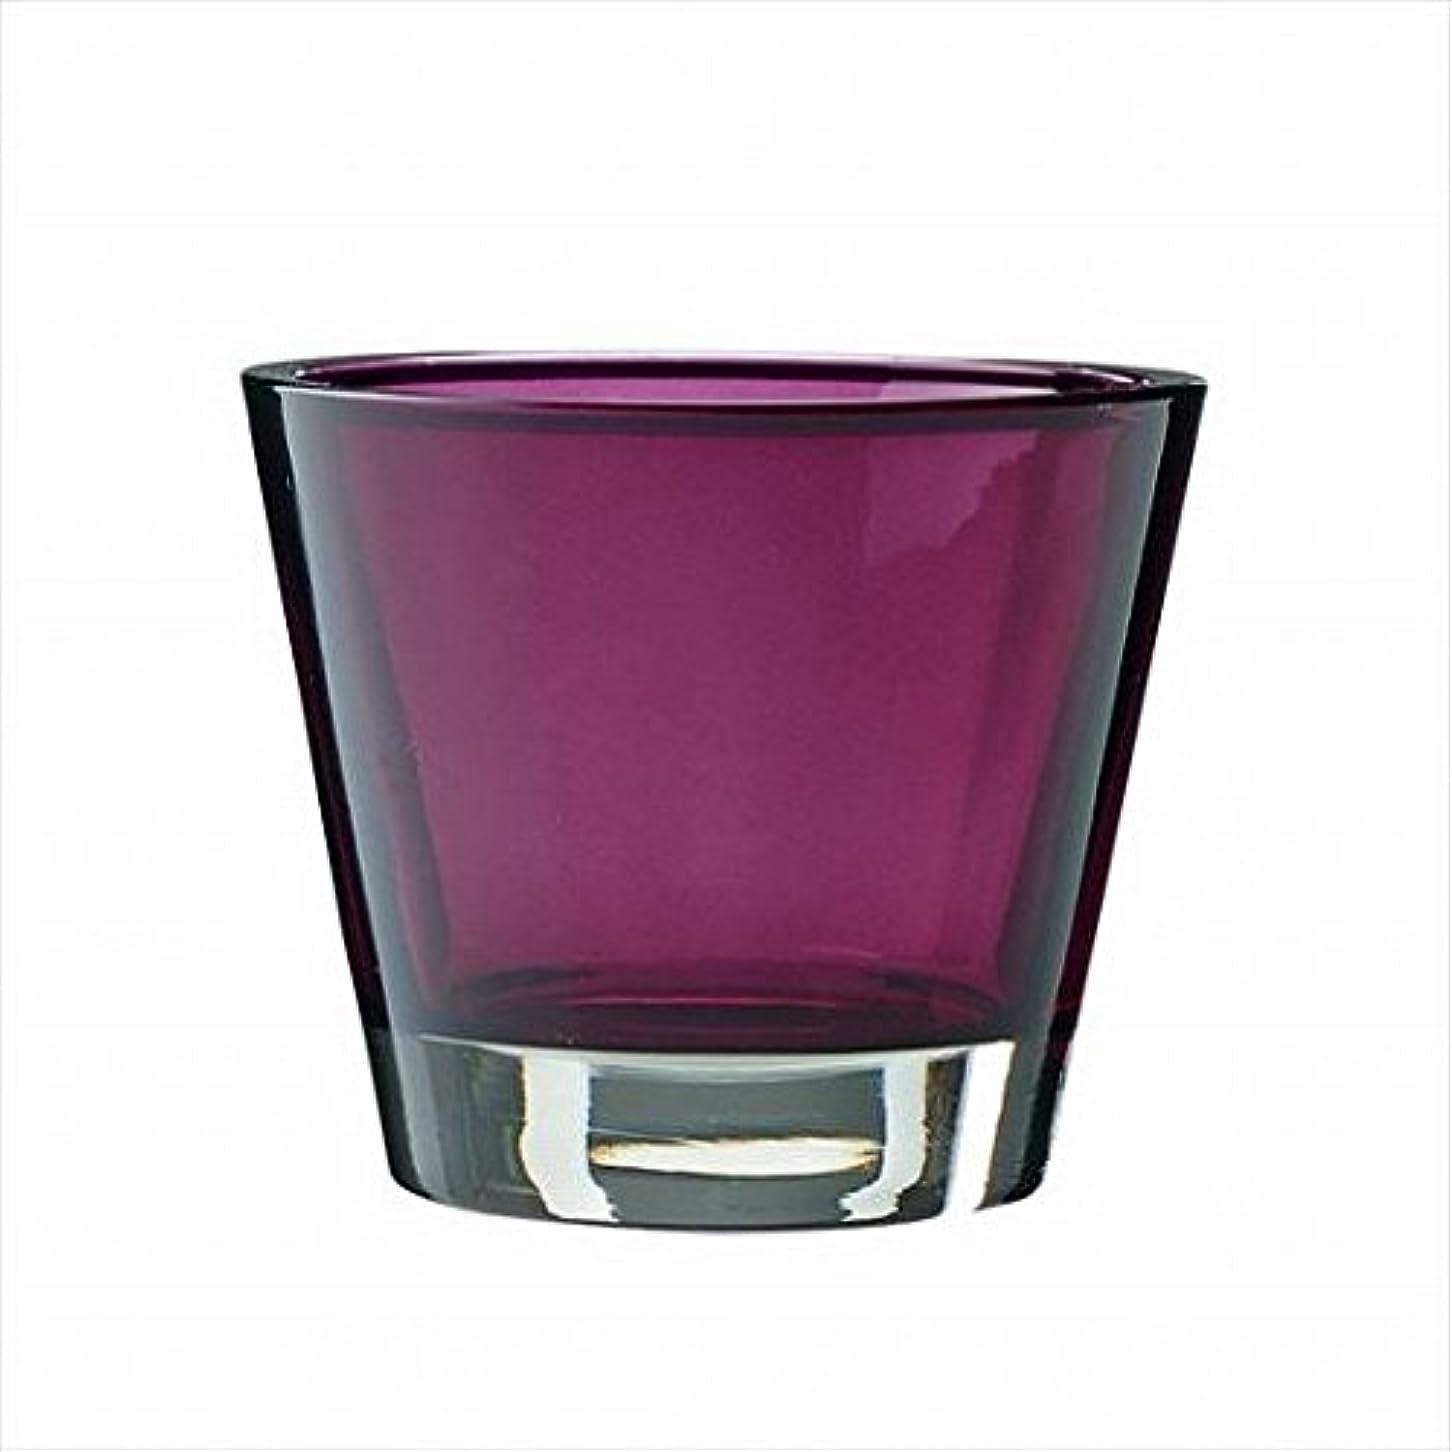 kameyama candle(カメヤマキャンドル) カラリス 「 プラム 」 キャンドル 82x82x70mm (J2540000PL)